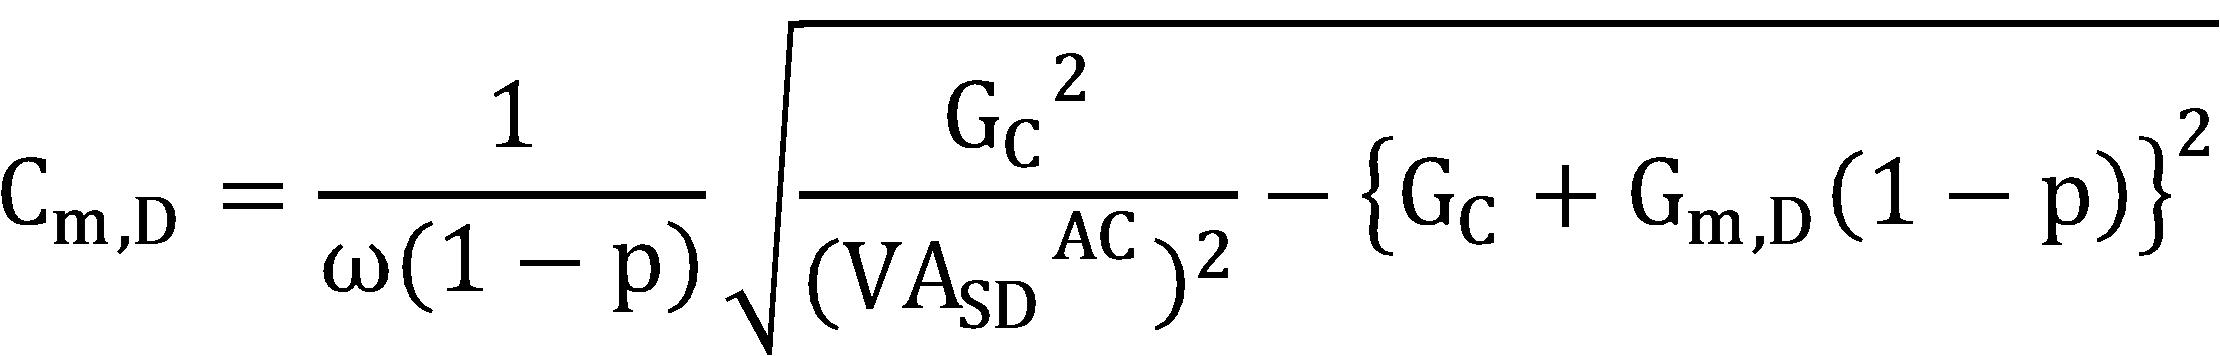 Figure 112014054251163-pat00011